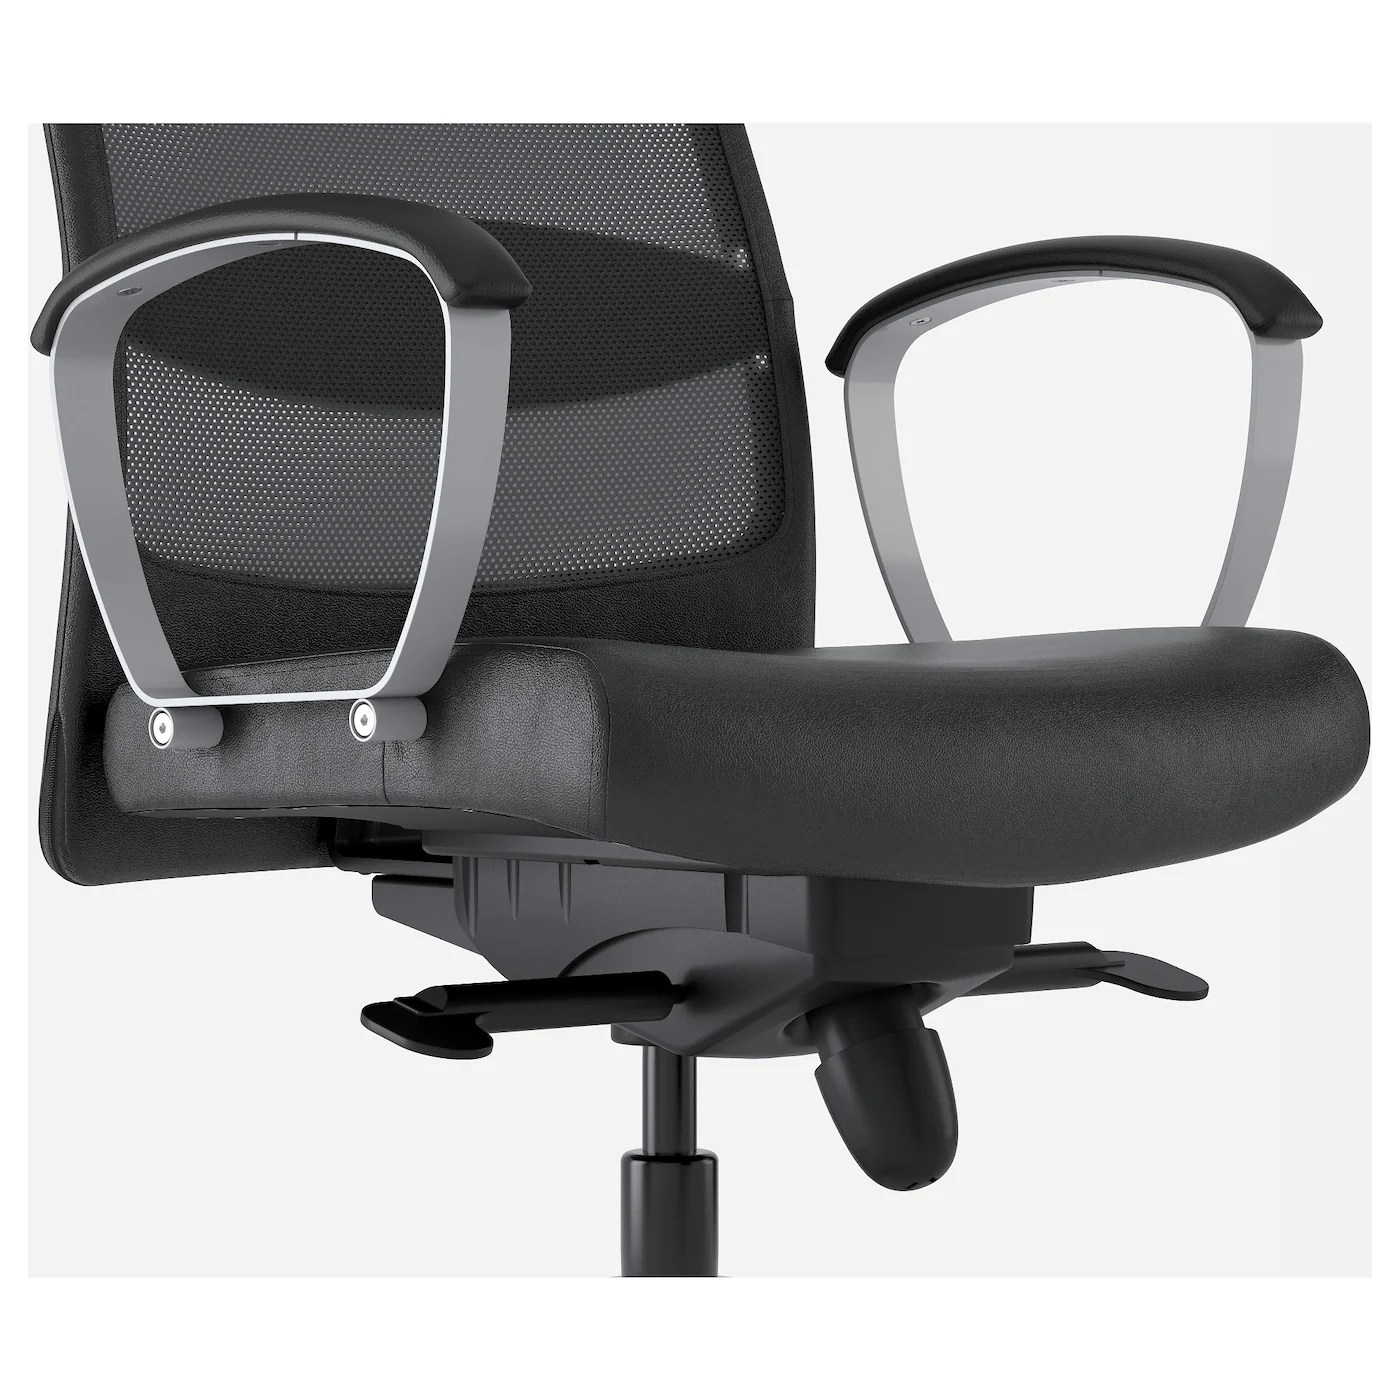 swivel chair jargon yoga ball chairs in the classroom markus glose black ikea